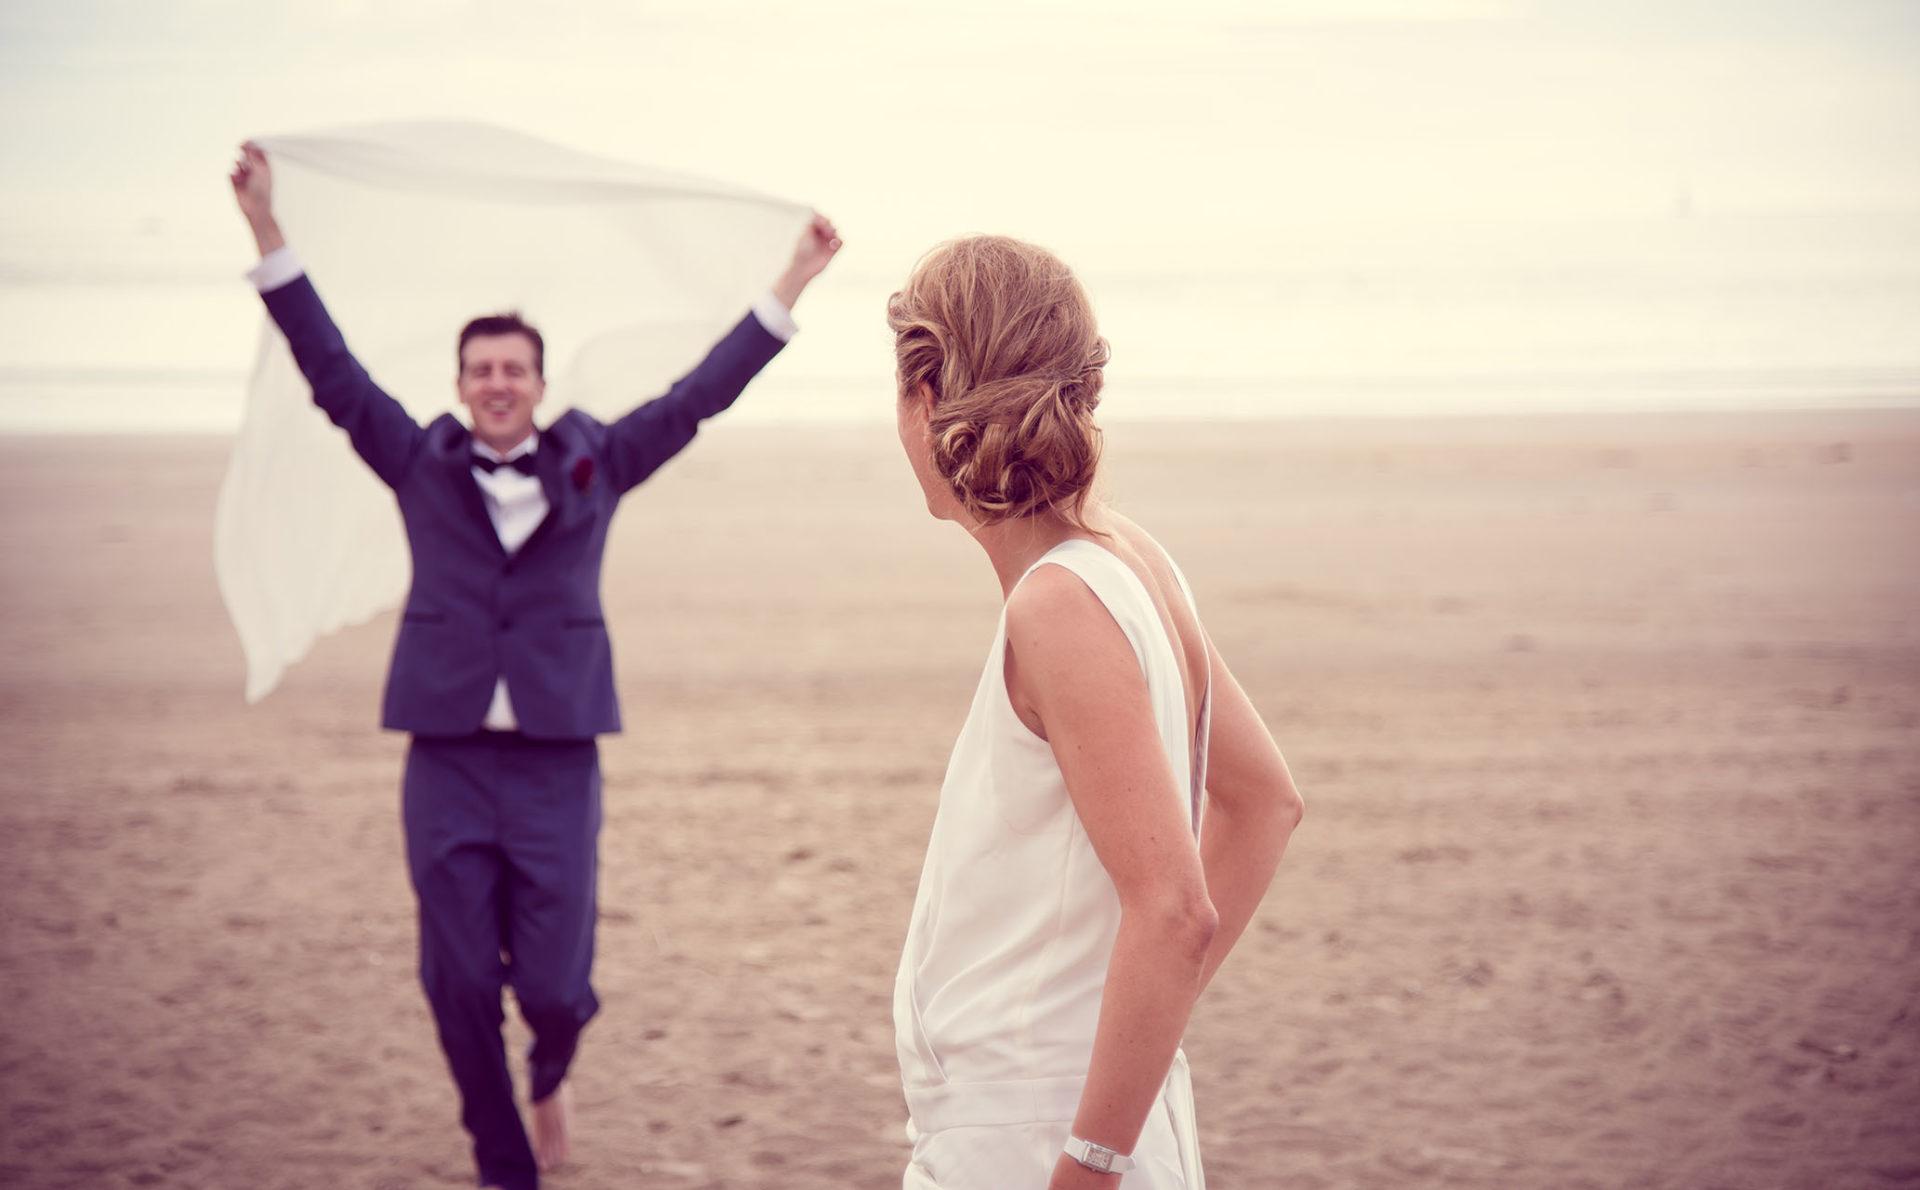 photographe-ile-de-france-mariage-yasmine-philippe-hauts-de-seine